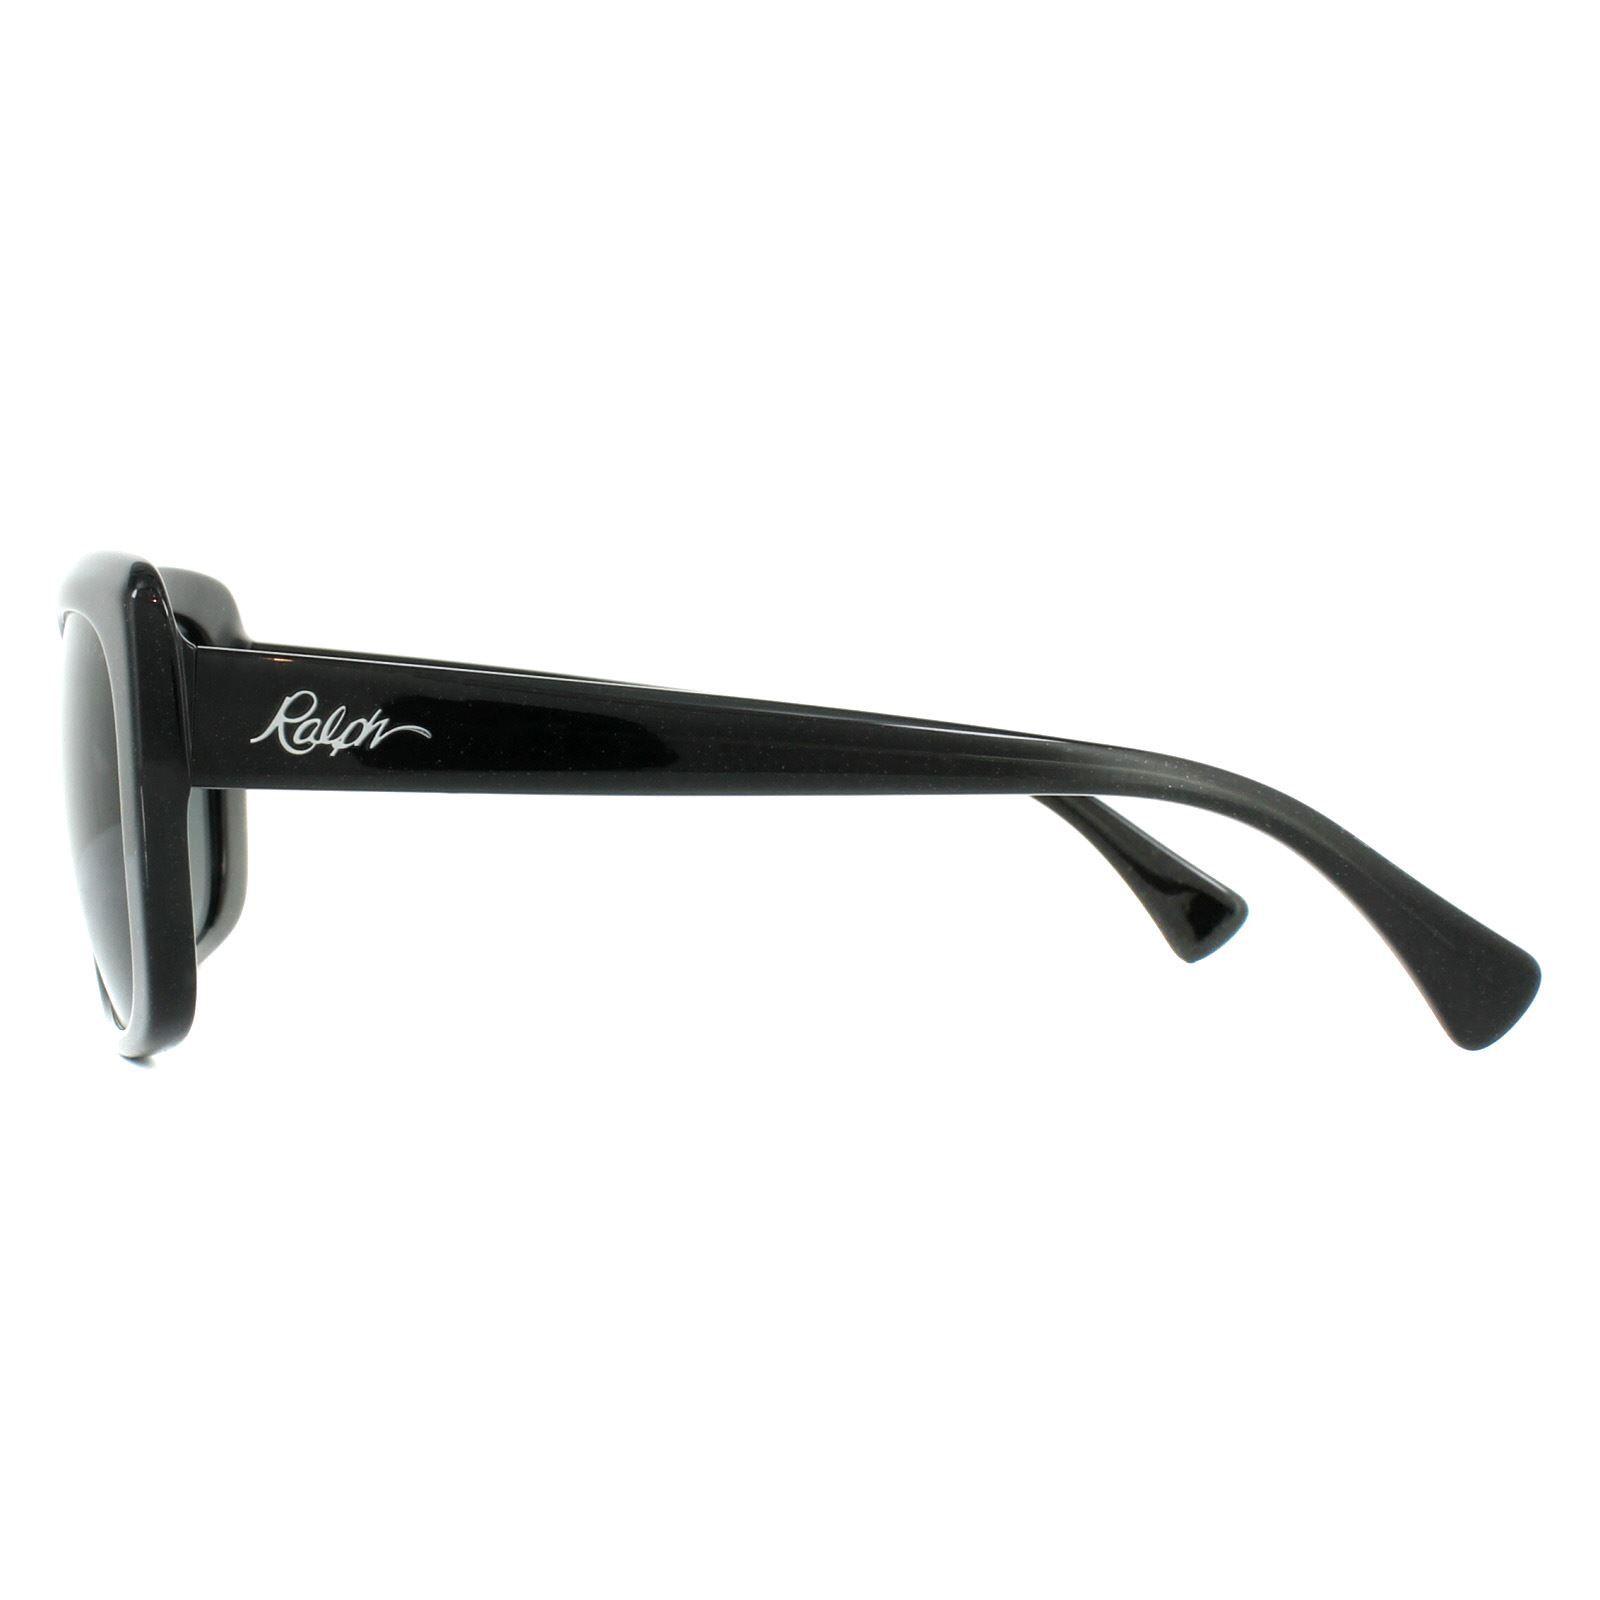 Ralph by Ralph Lauren Sunglasses RA5241 568187 Shiny Black Glitter Grey